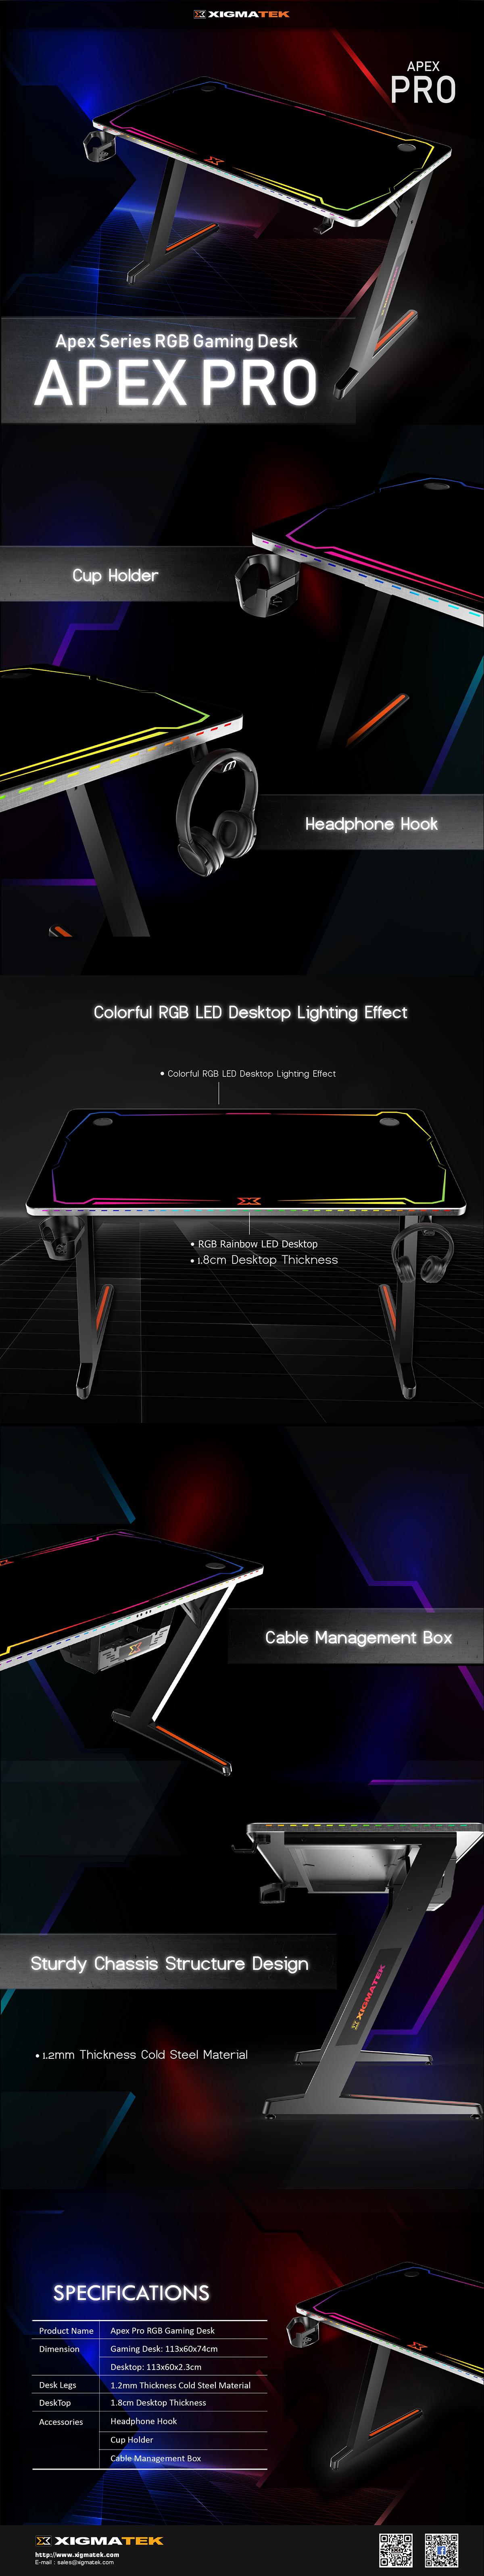 Xigmatek Apex Series RGB Gaming Desk APEX PRO - EN46836 4